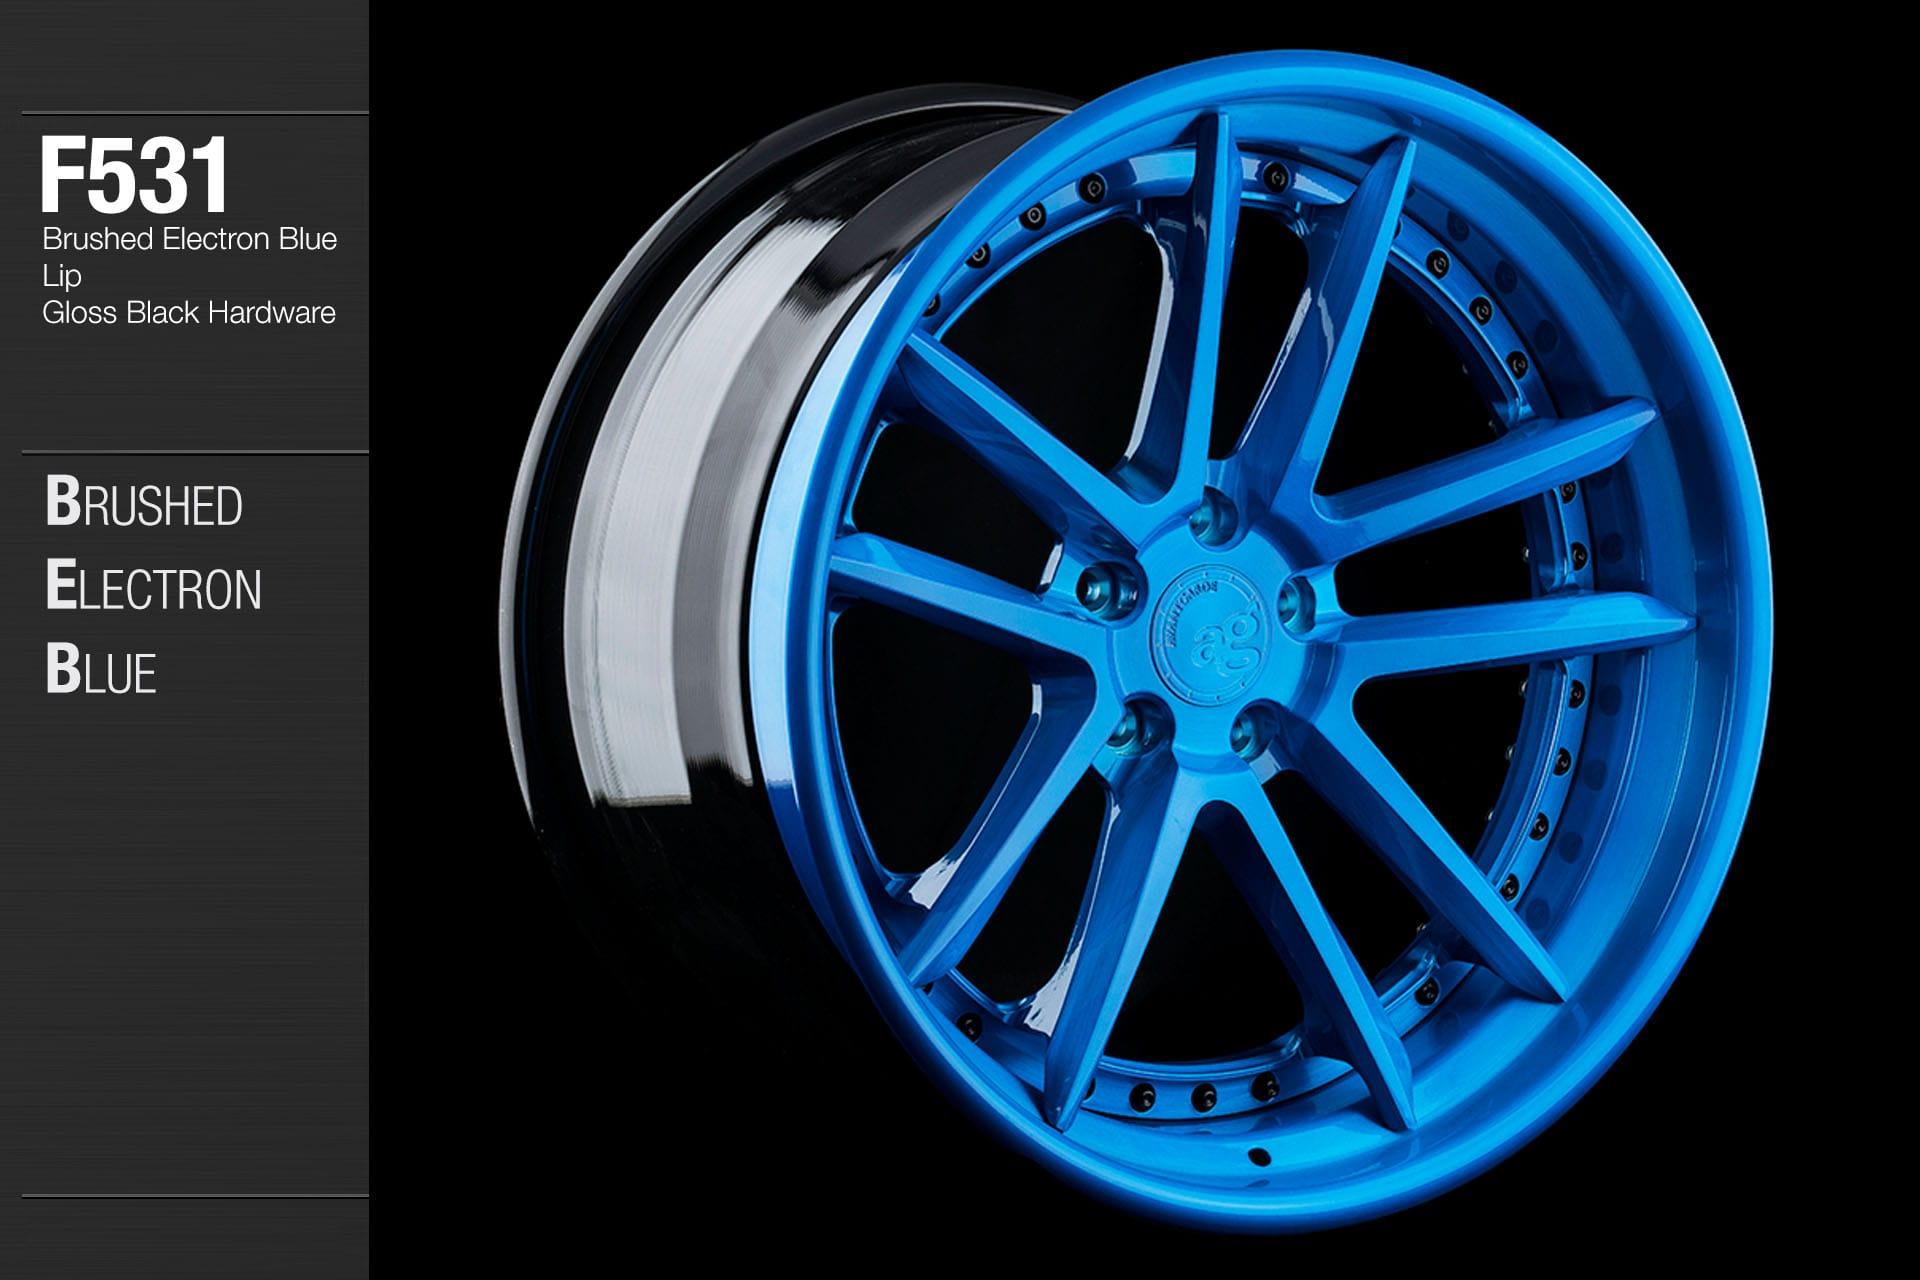 avant-garde-ag-wheels-f531-brushed-electron-blue-face-lip-gloss-black-hardware-4-min